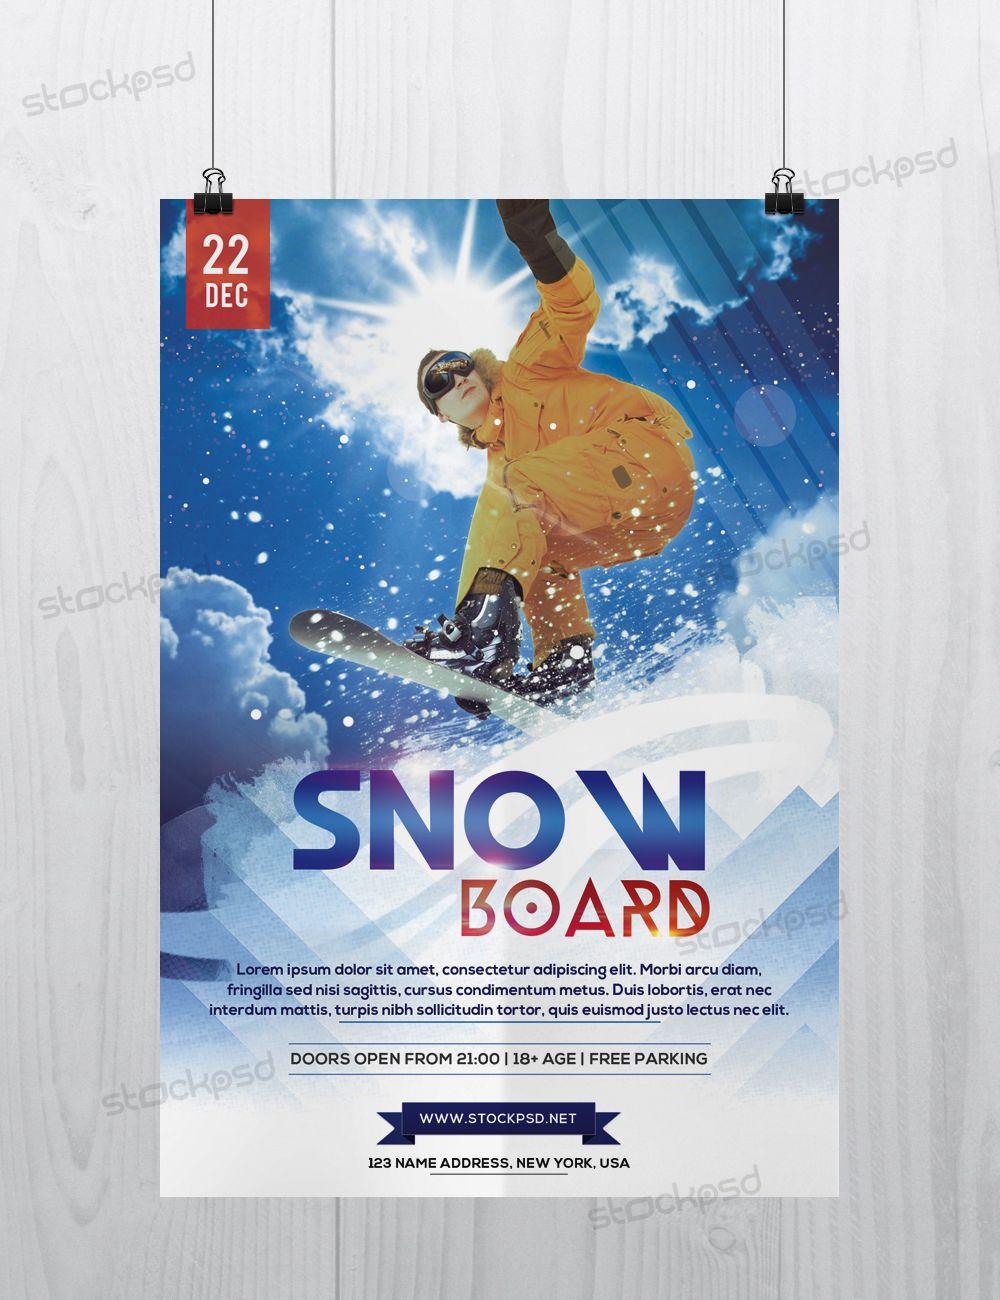 SnowBoards Sport  Freebie Psd Flyer Template  Psd Flyers